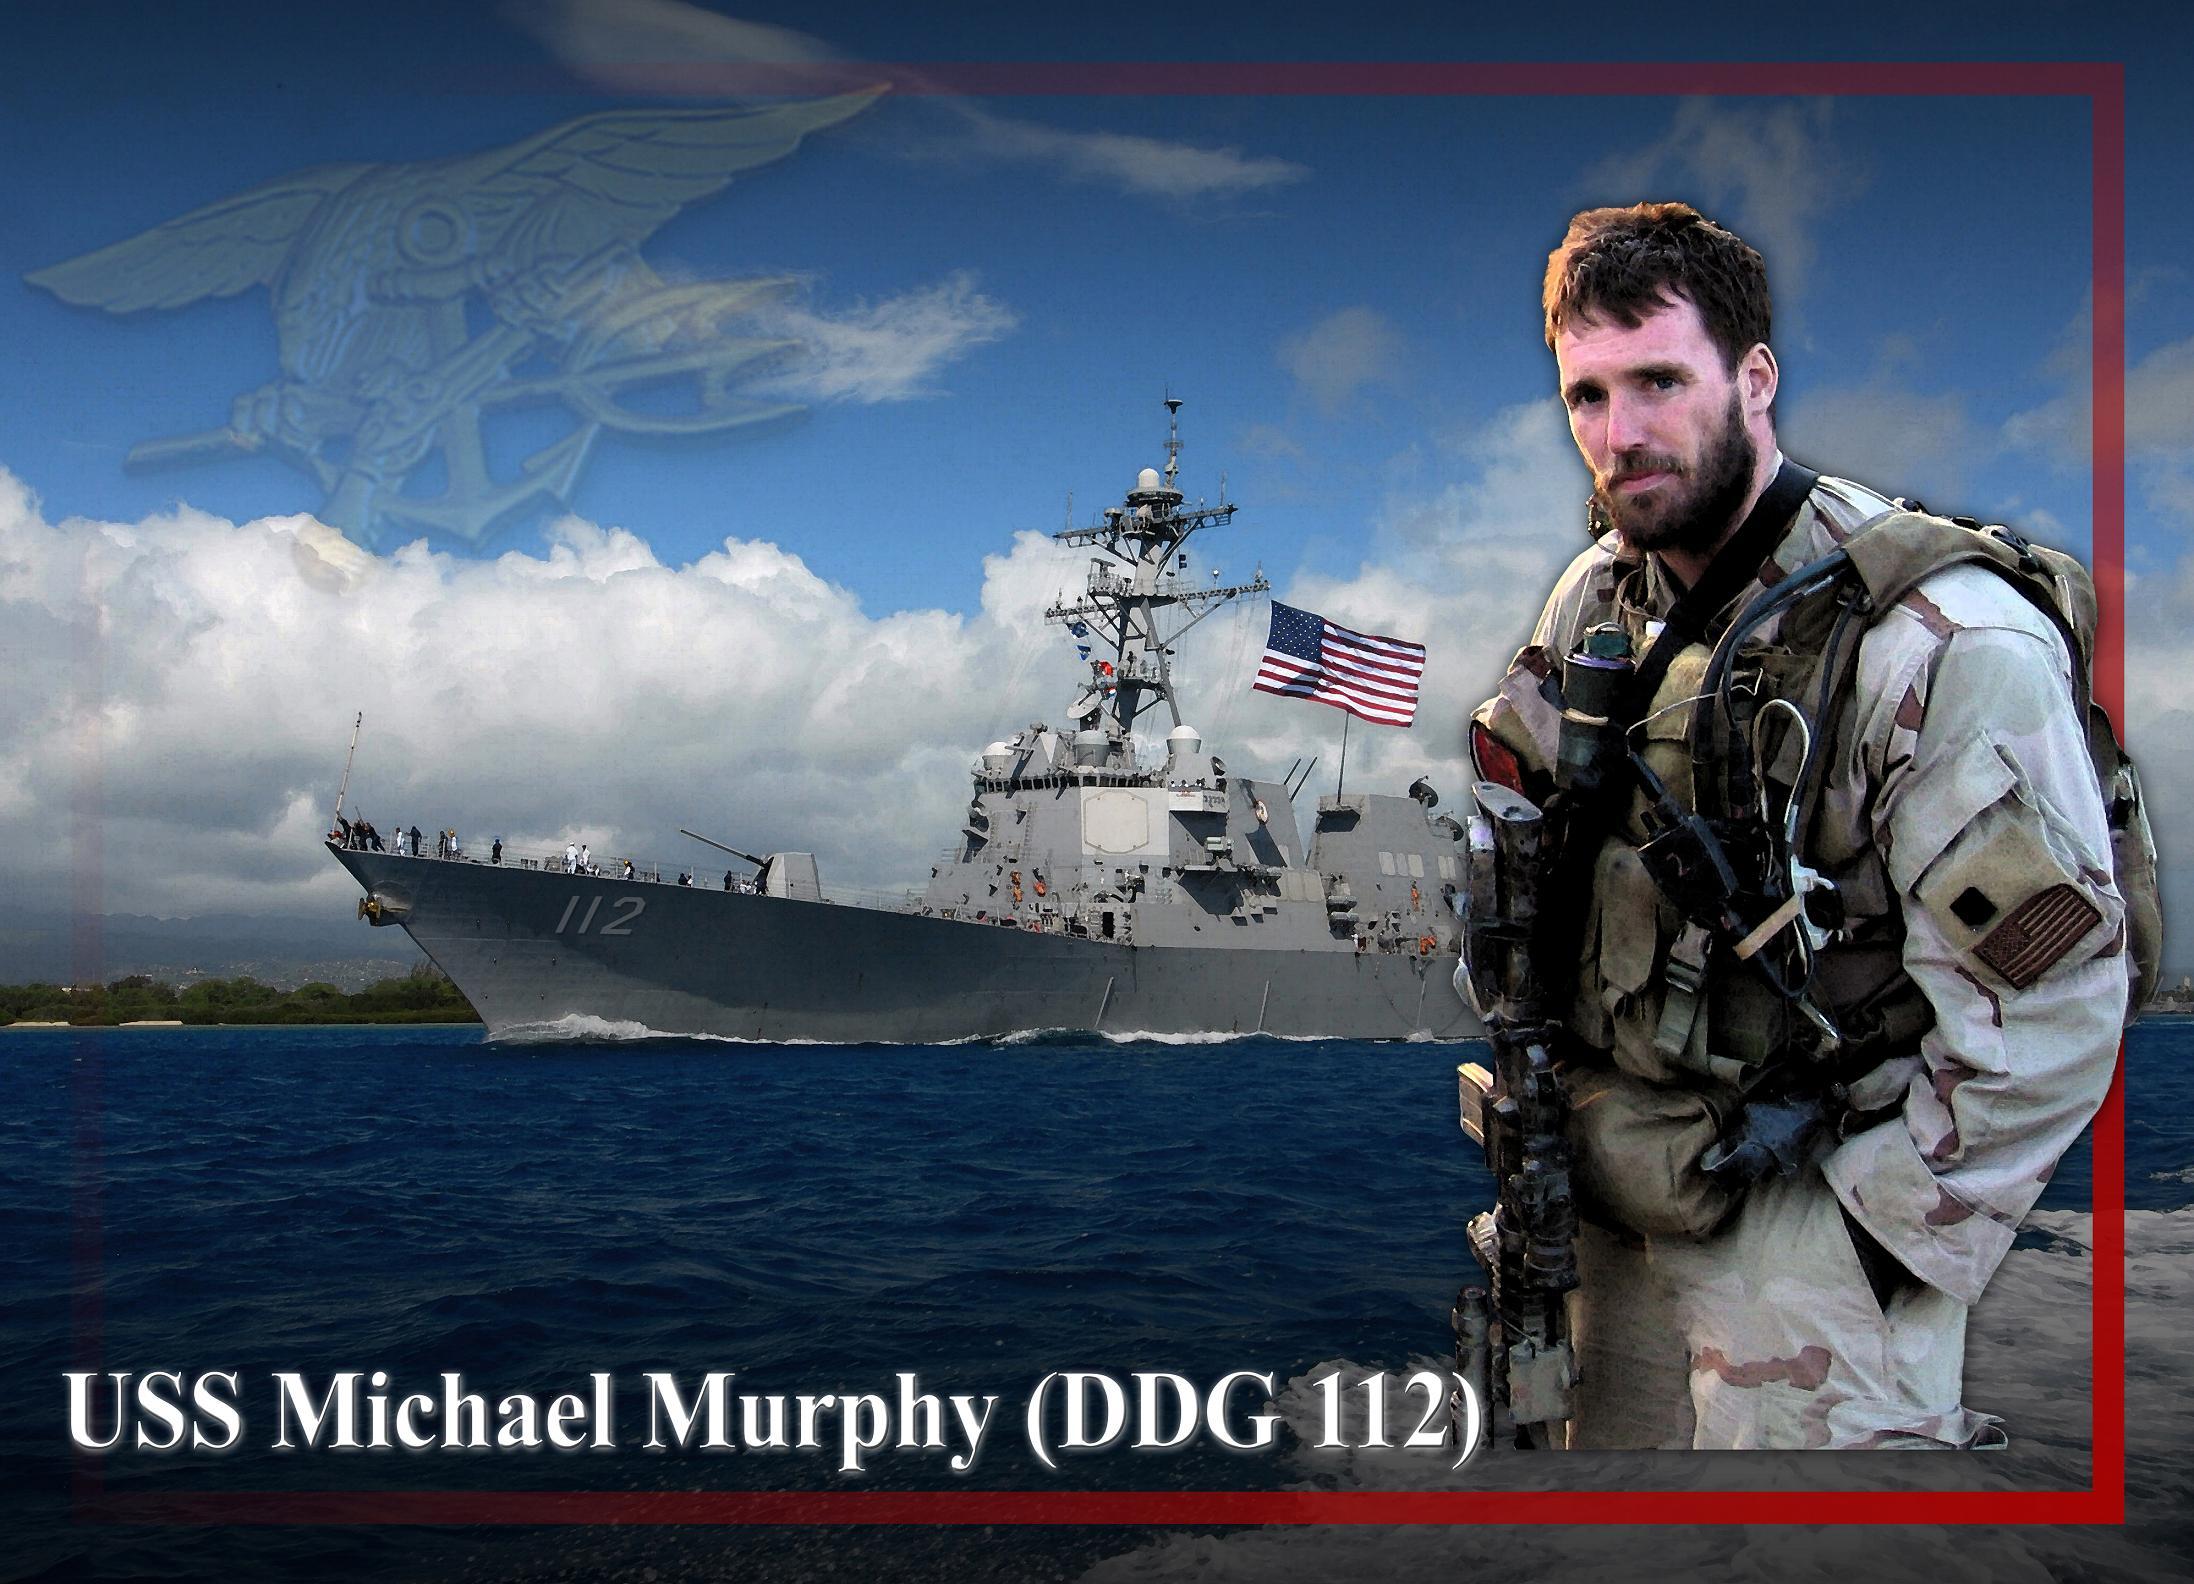 USS Michael Murphy (DDG 112) photo illustration.jpg